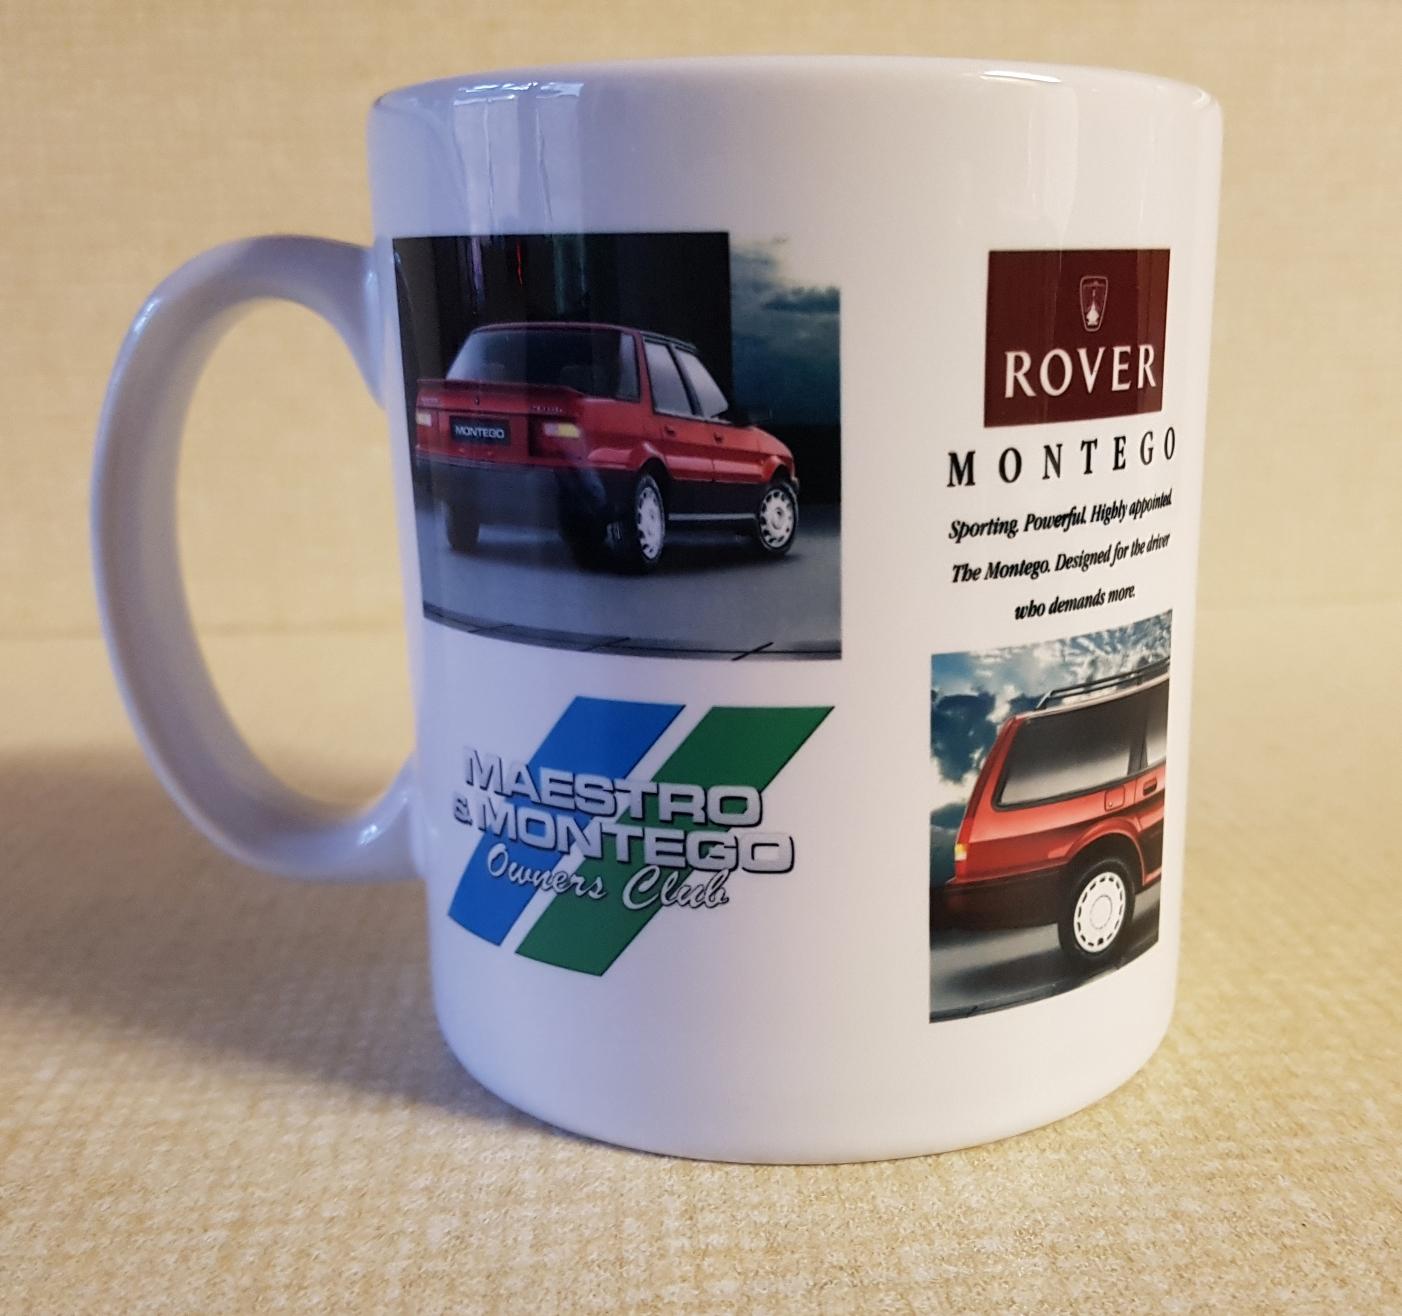 Mug with Rover Montego artwork - Maestro & Montego Owners Club